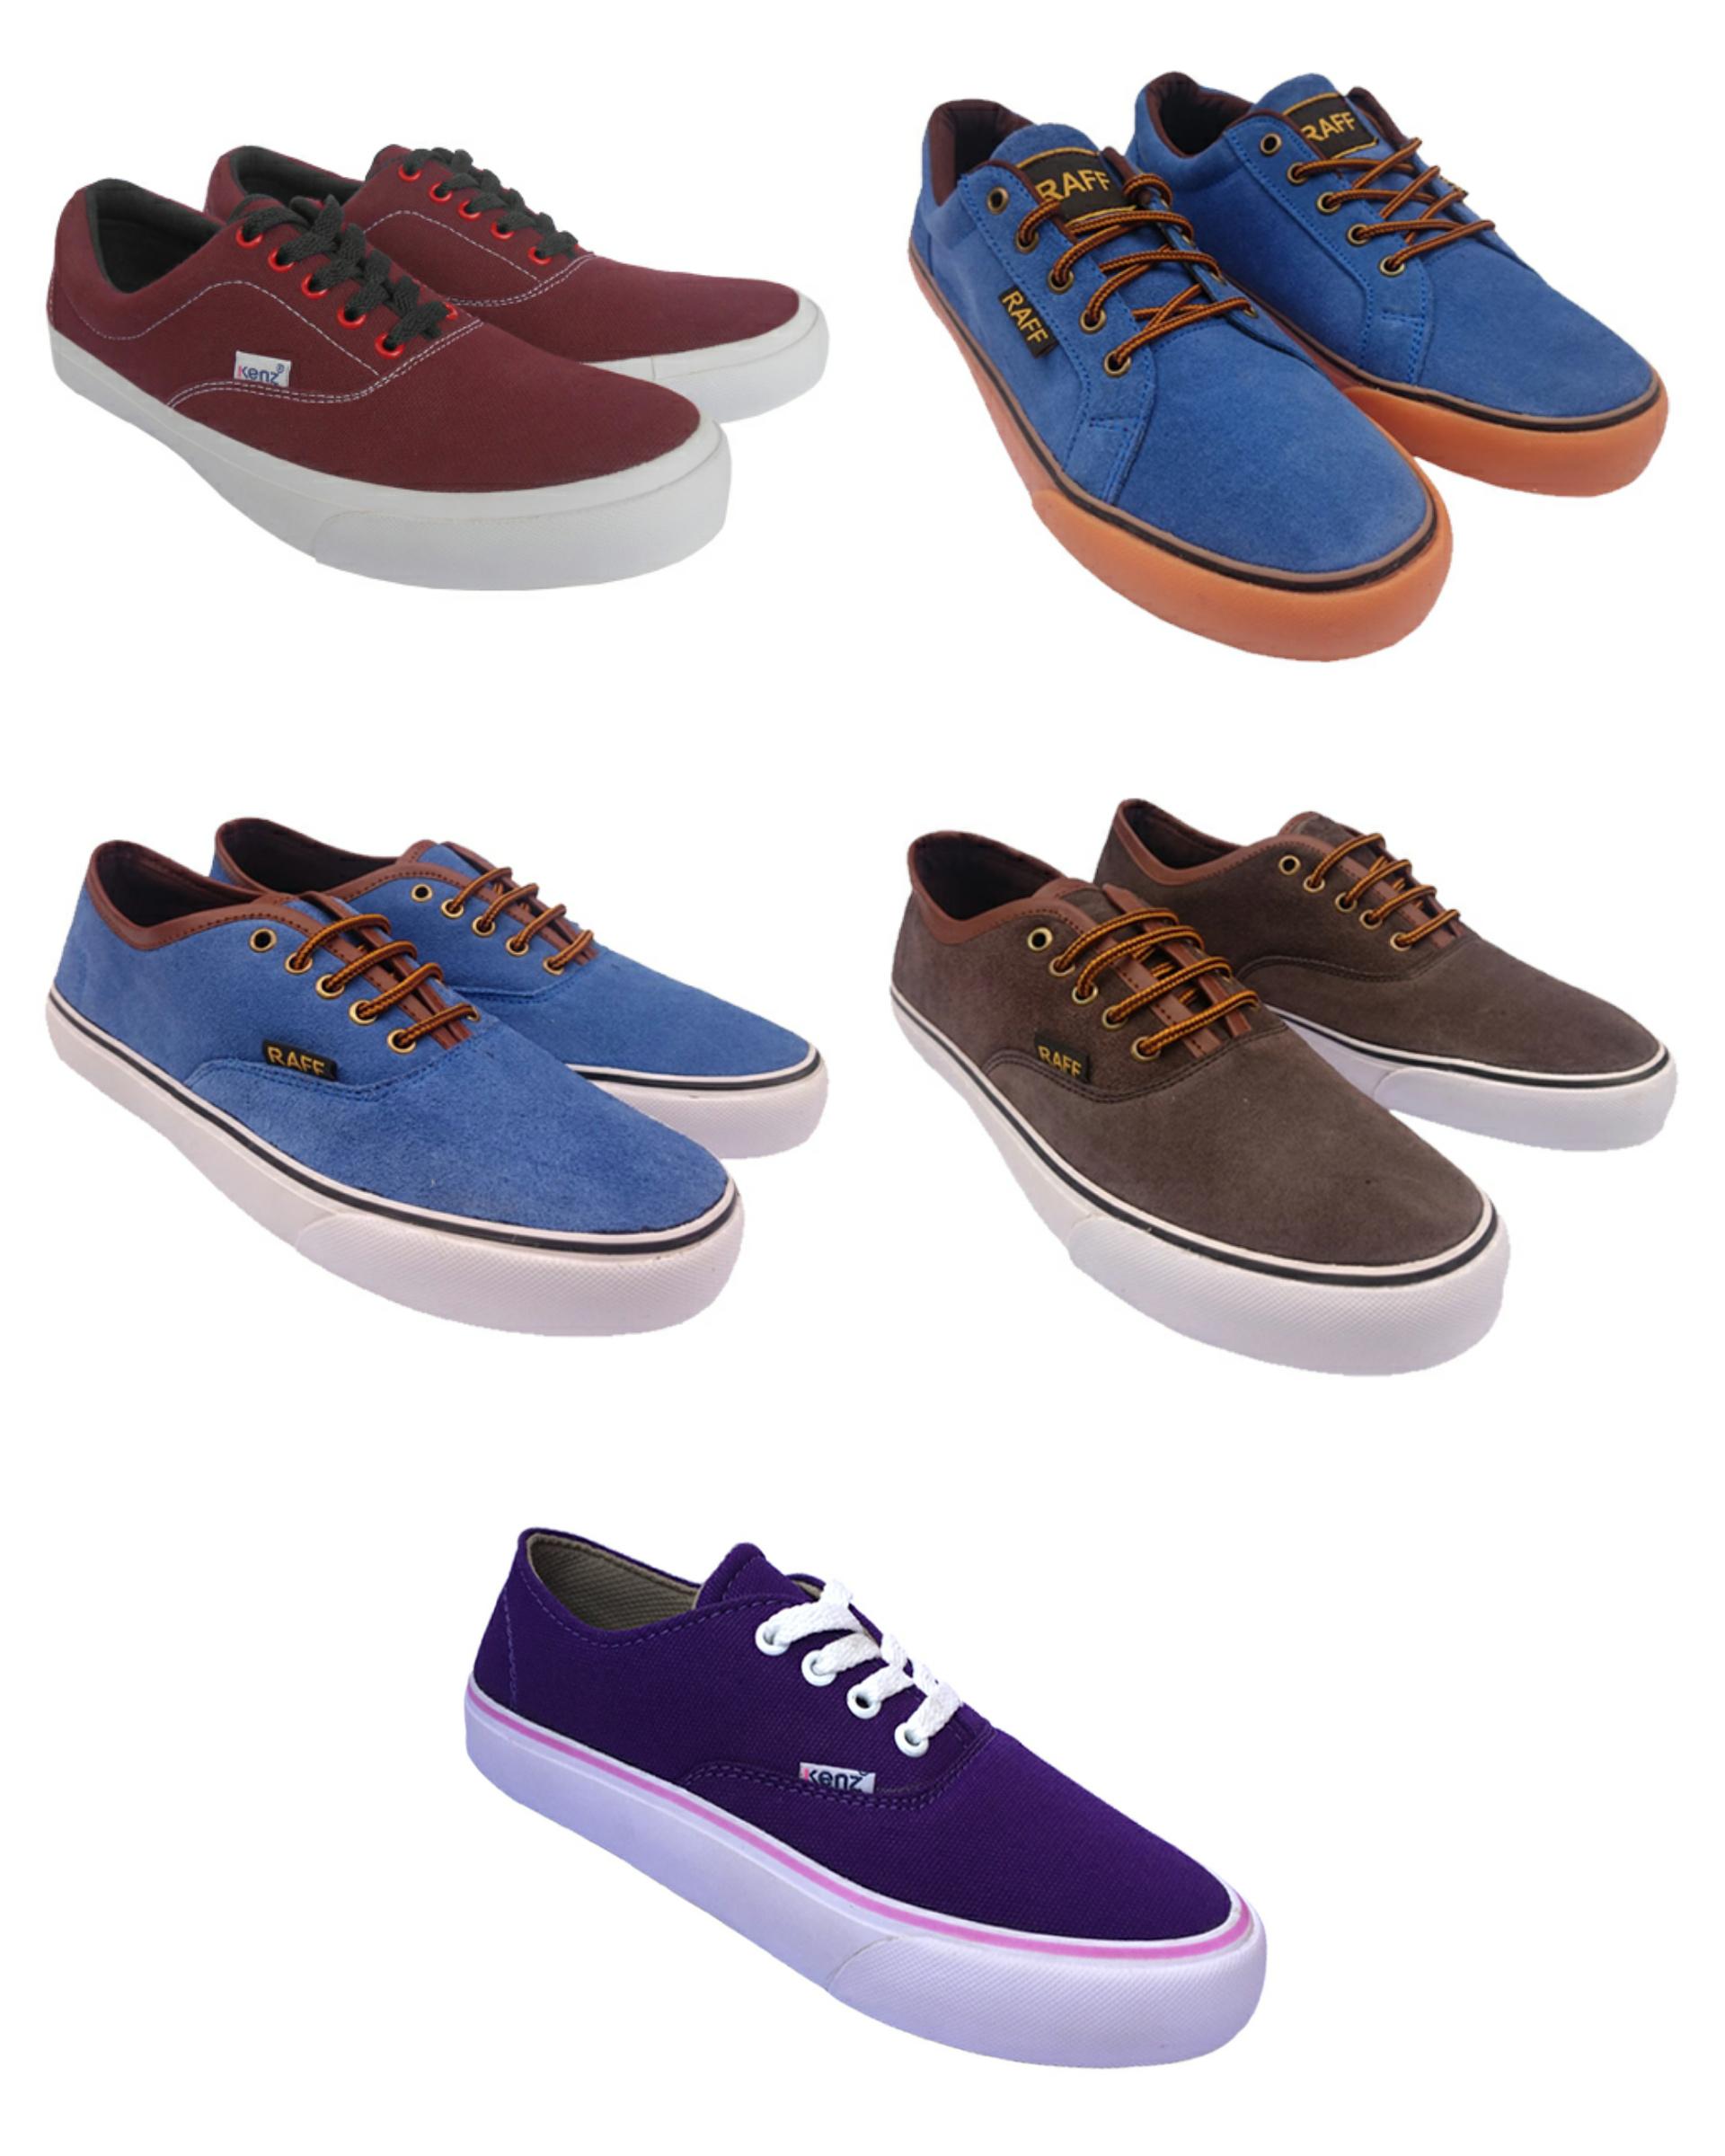 Qoo promo mens shoes and casual women kenz and raff jpg 1920x2400 Raff shoes 29ae75014